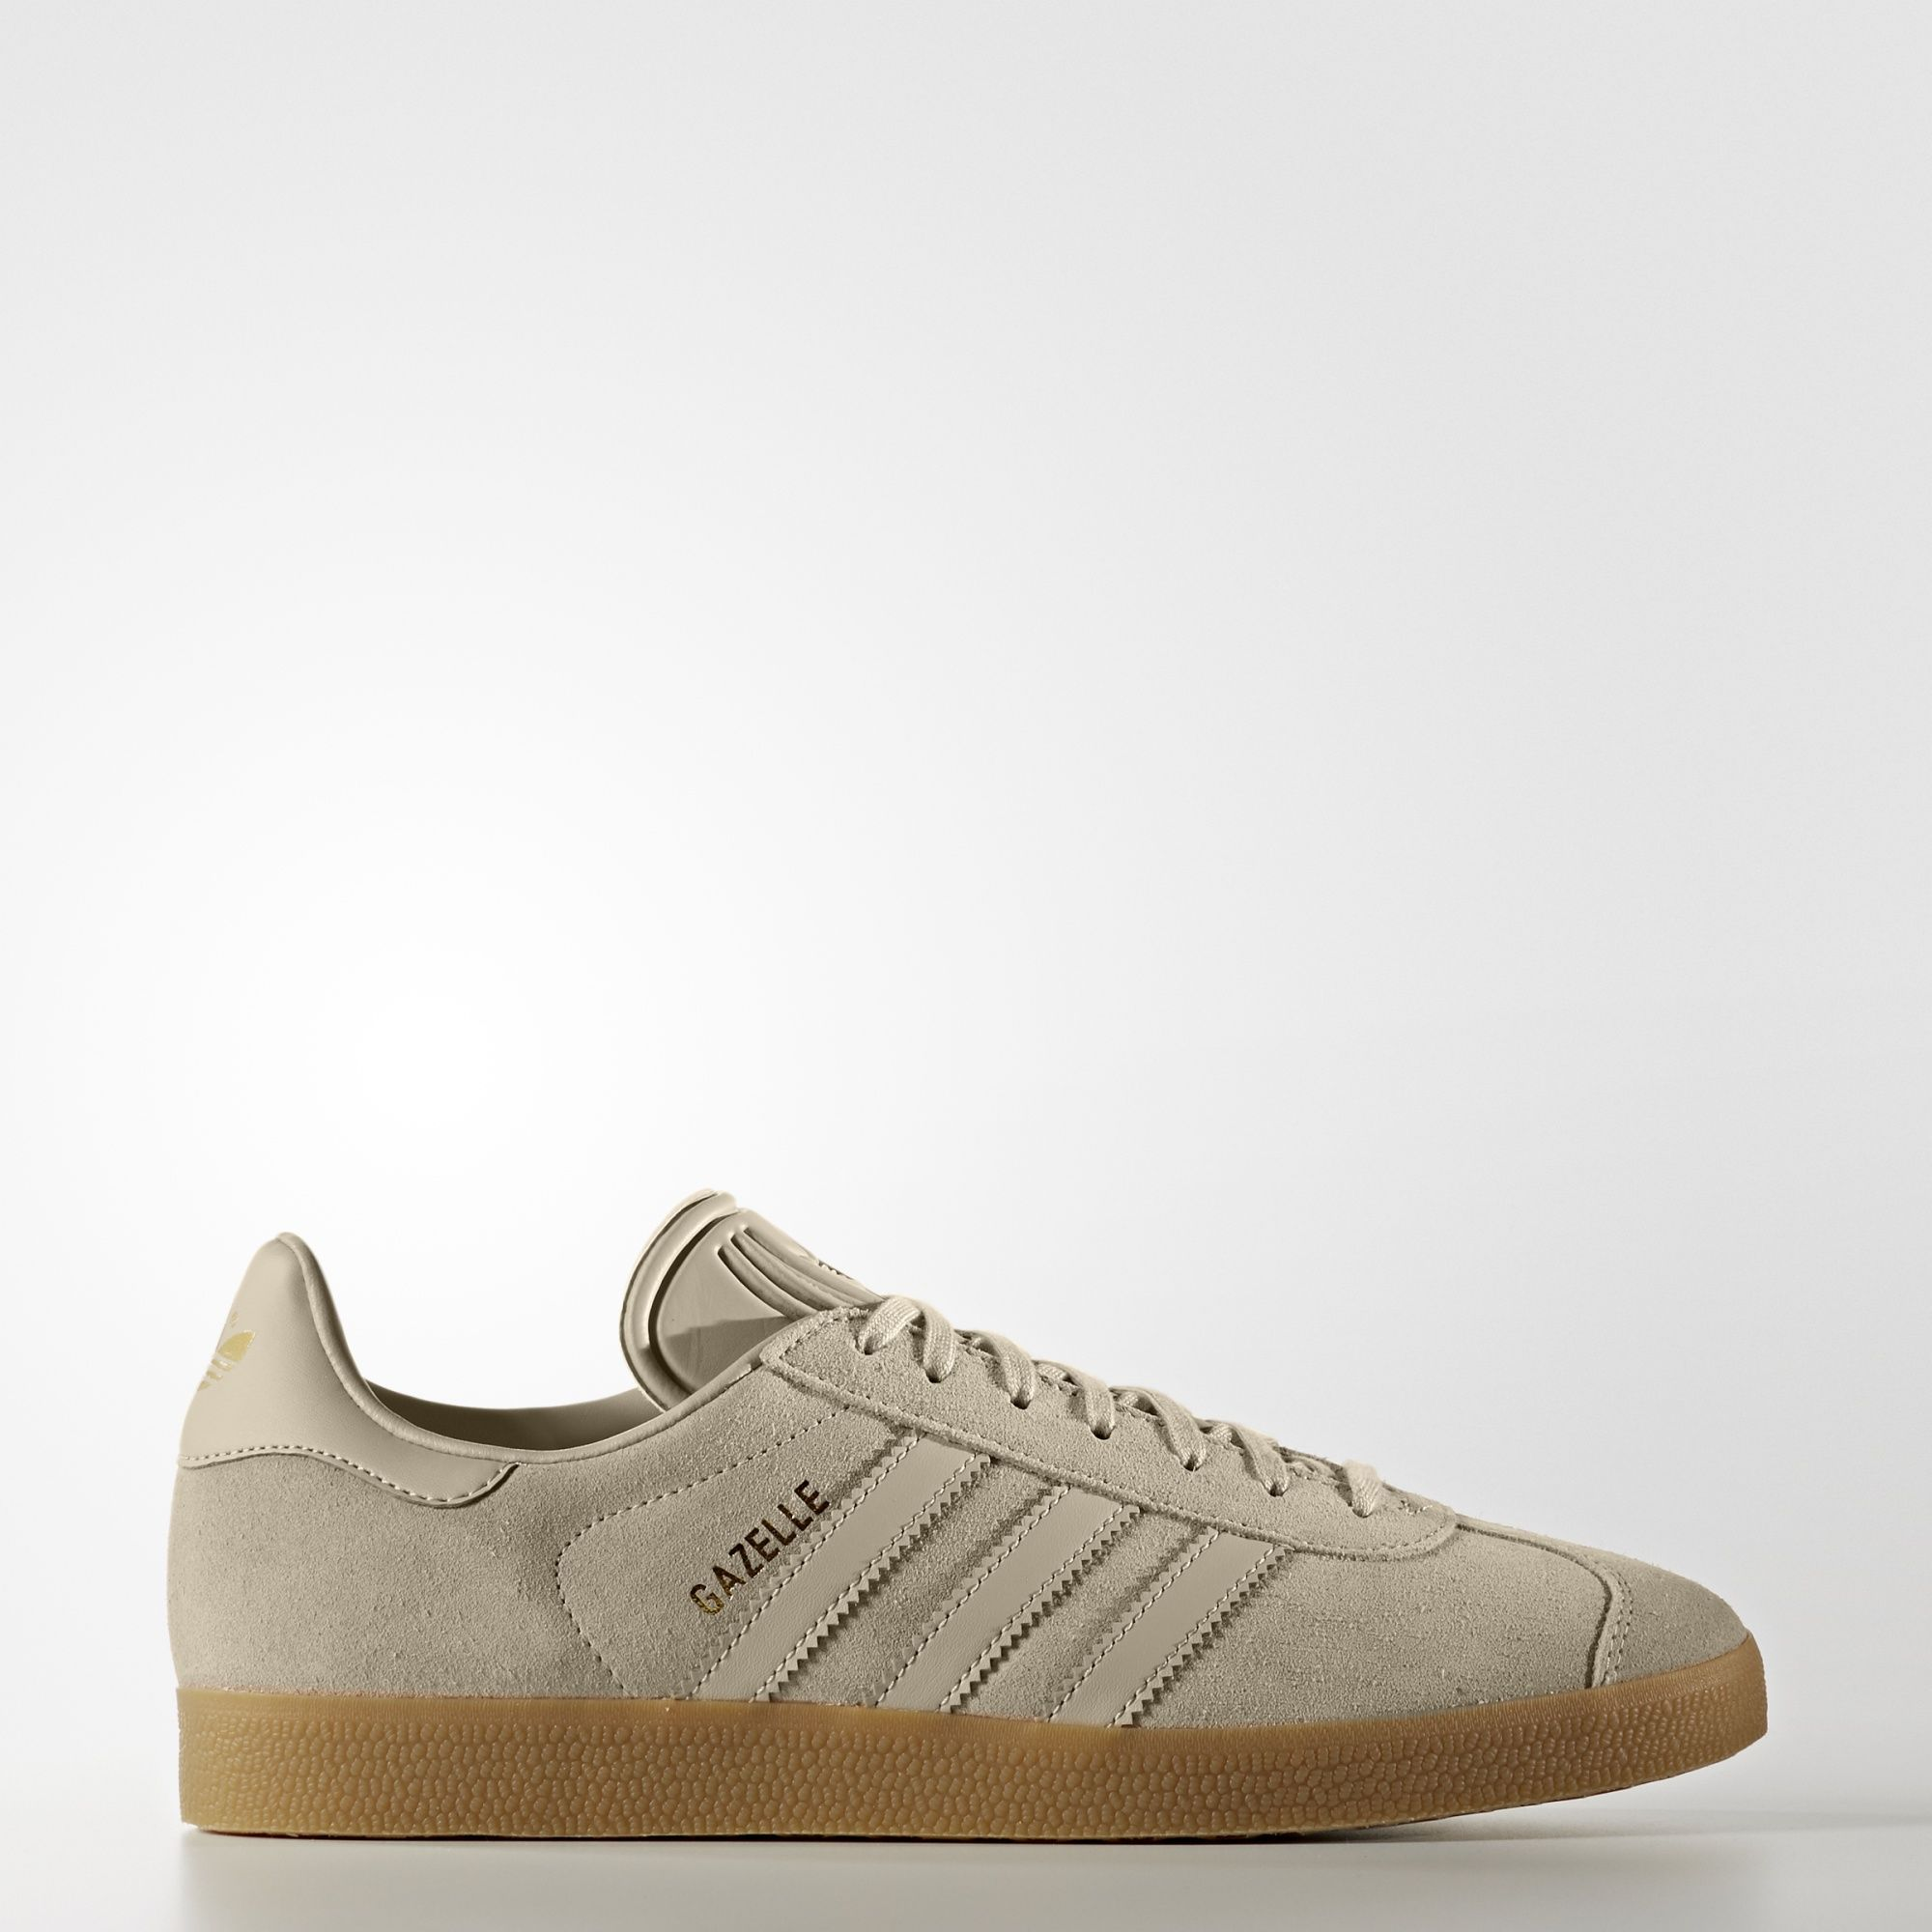 Adidas gazzella scarpe adidas gazzella e scarpe da ginnastica pinterest